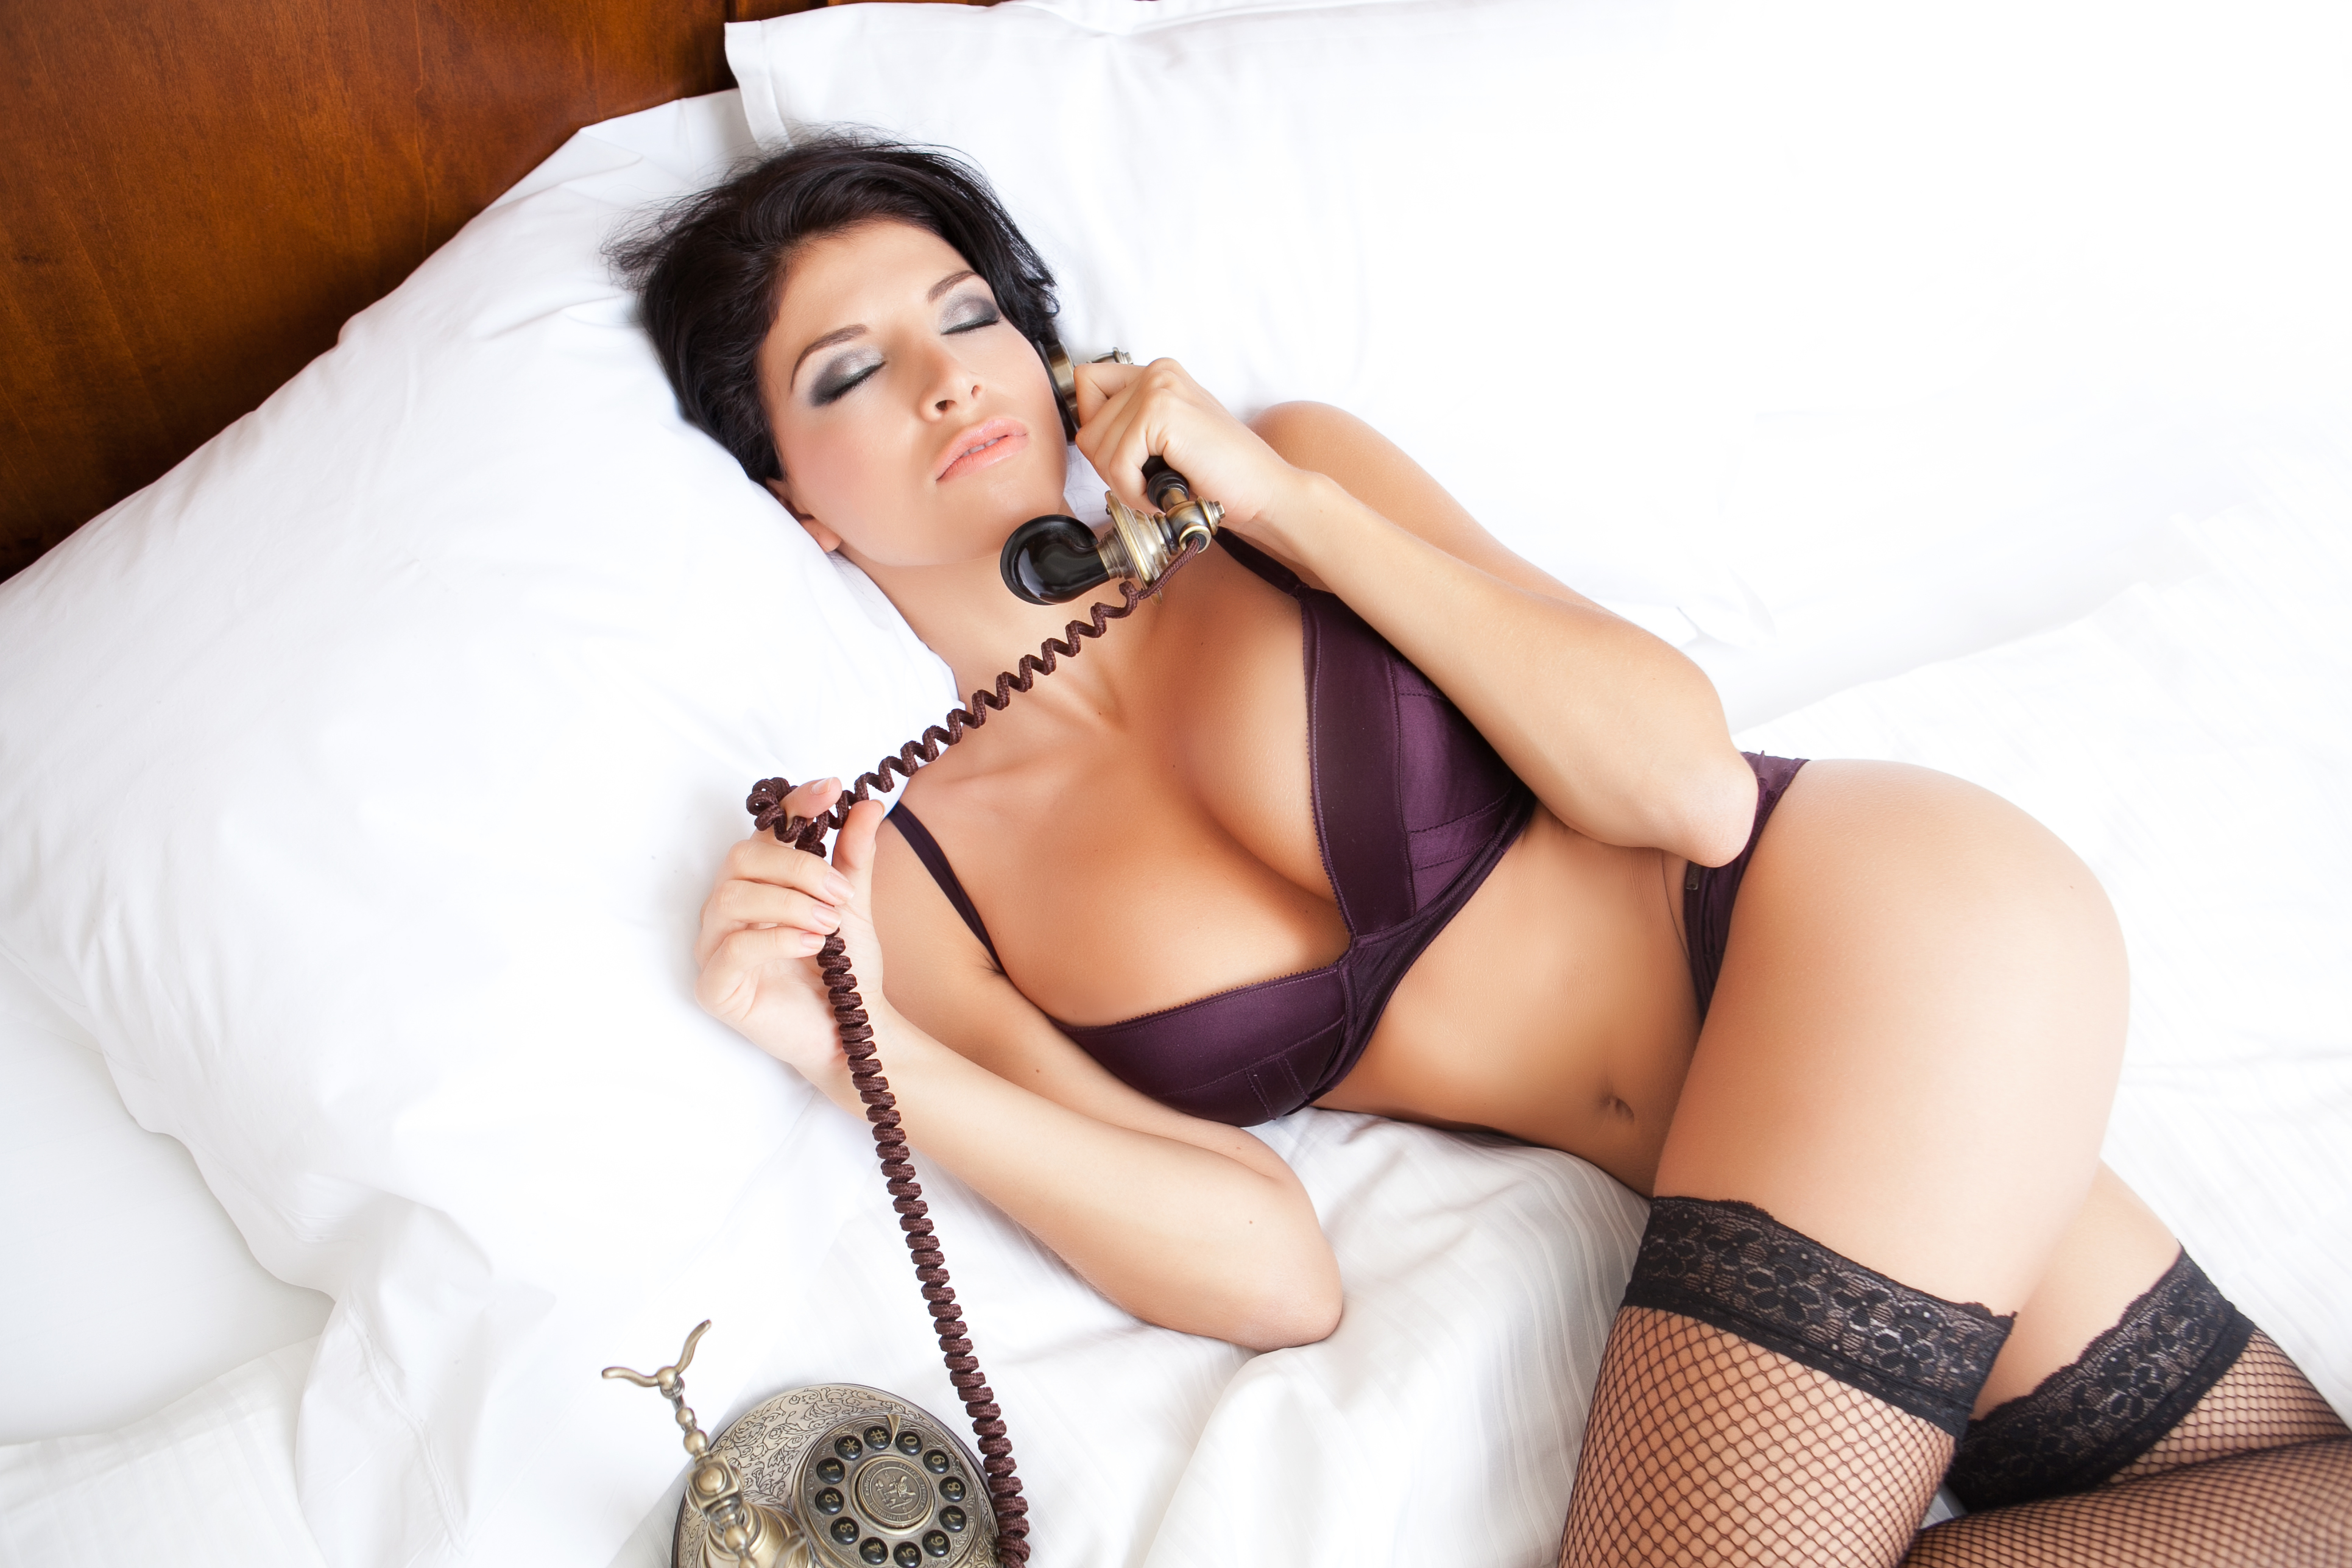 Phone sex bianca